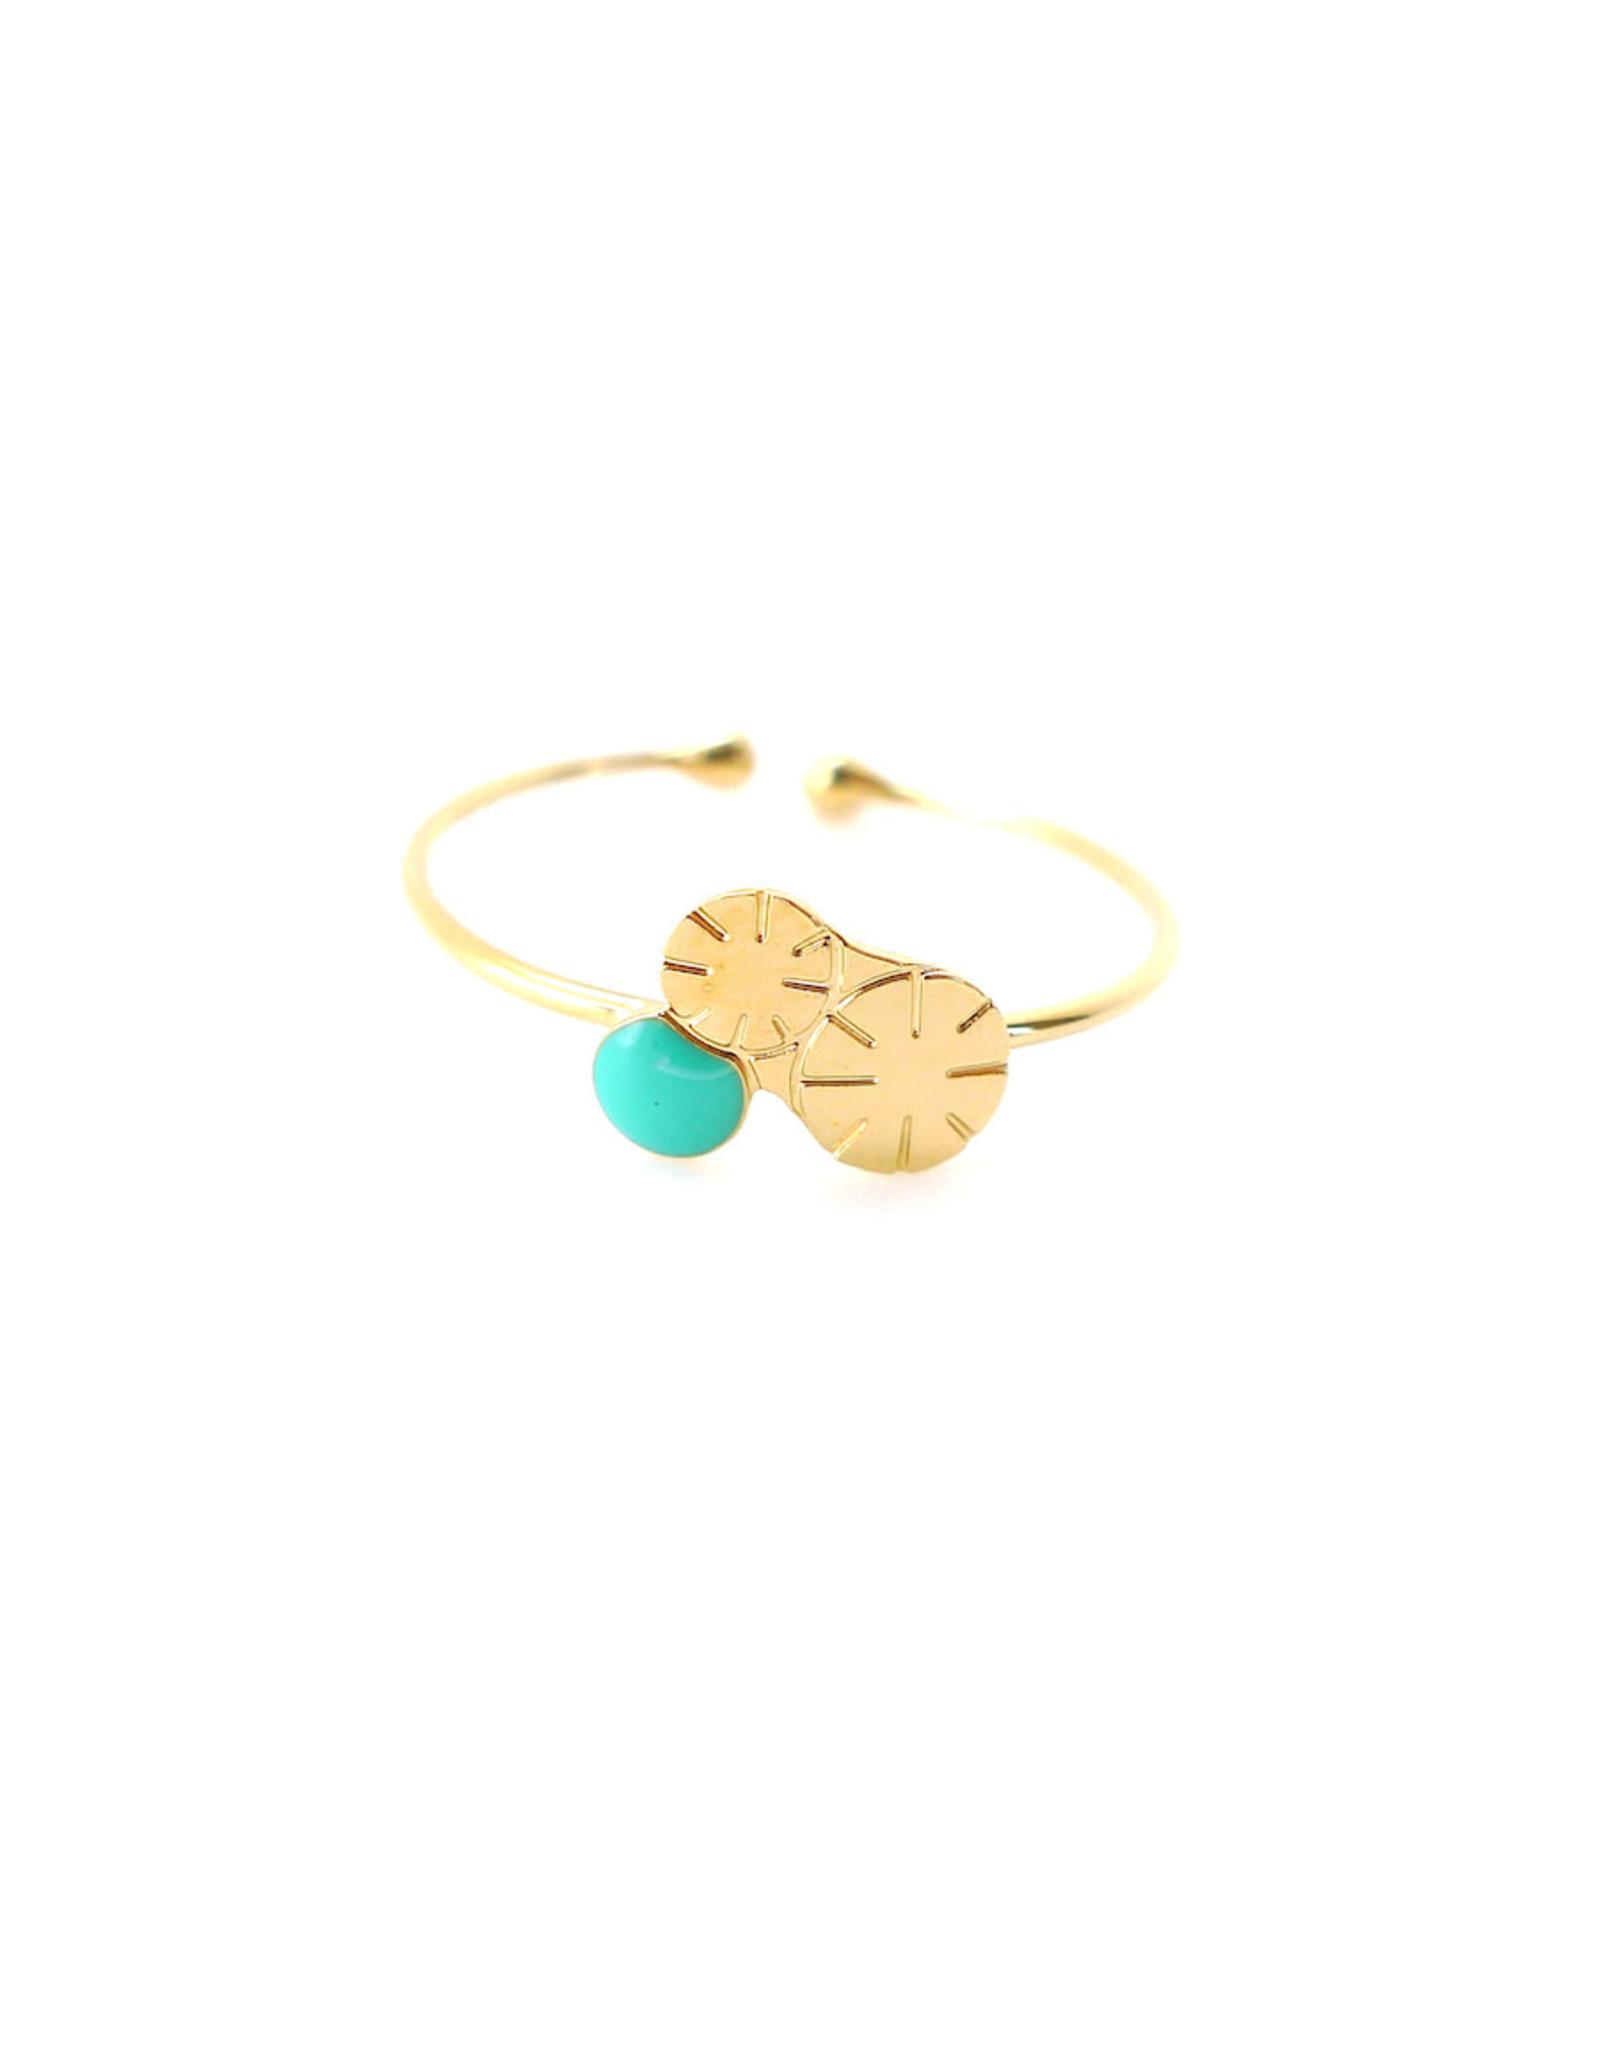 Nadja Carlotti Ring Berry - Appelblauwzeegroen  - Messing Verguld - Geïnspireerd op een bloem - Verstelbaar - Patroon B 0,9 x H 0,7 cm